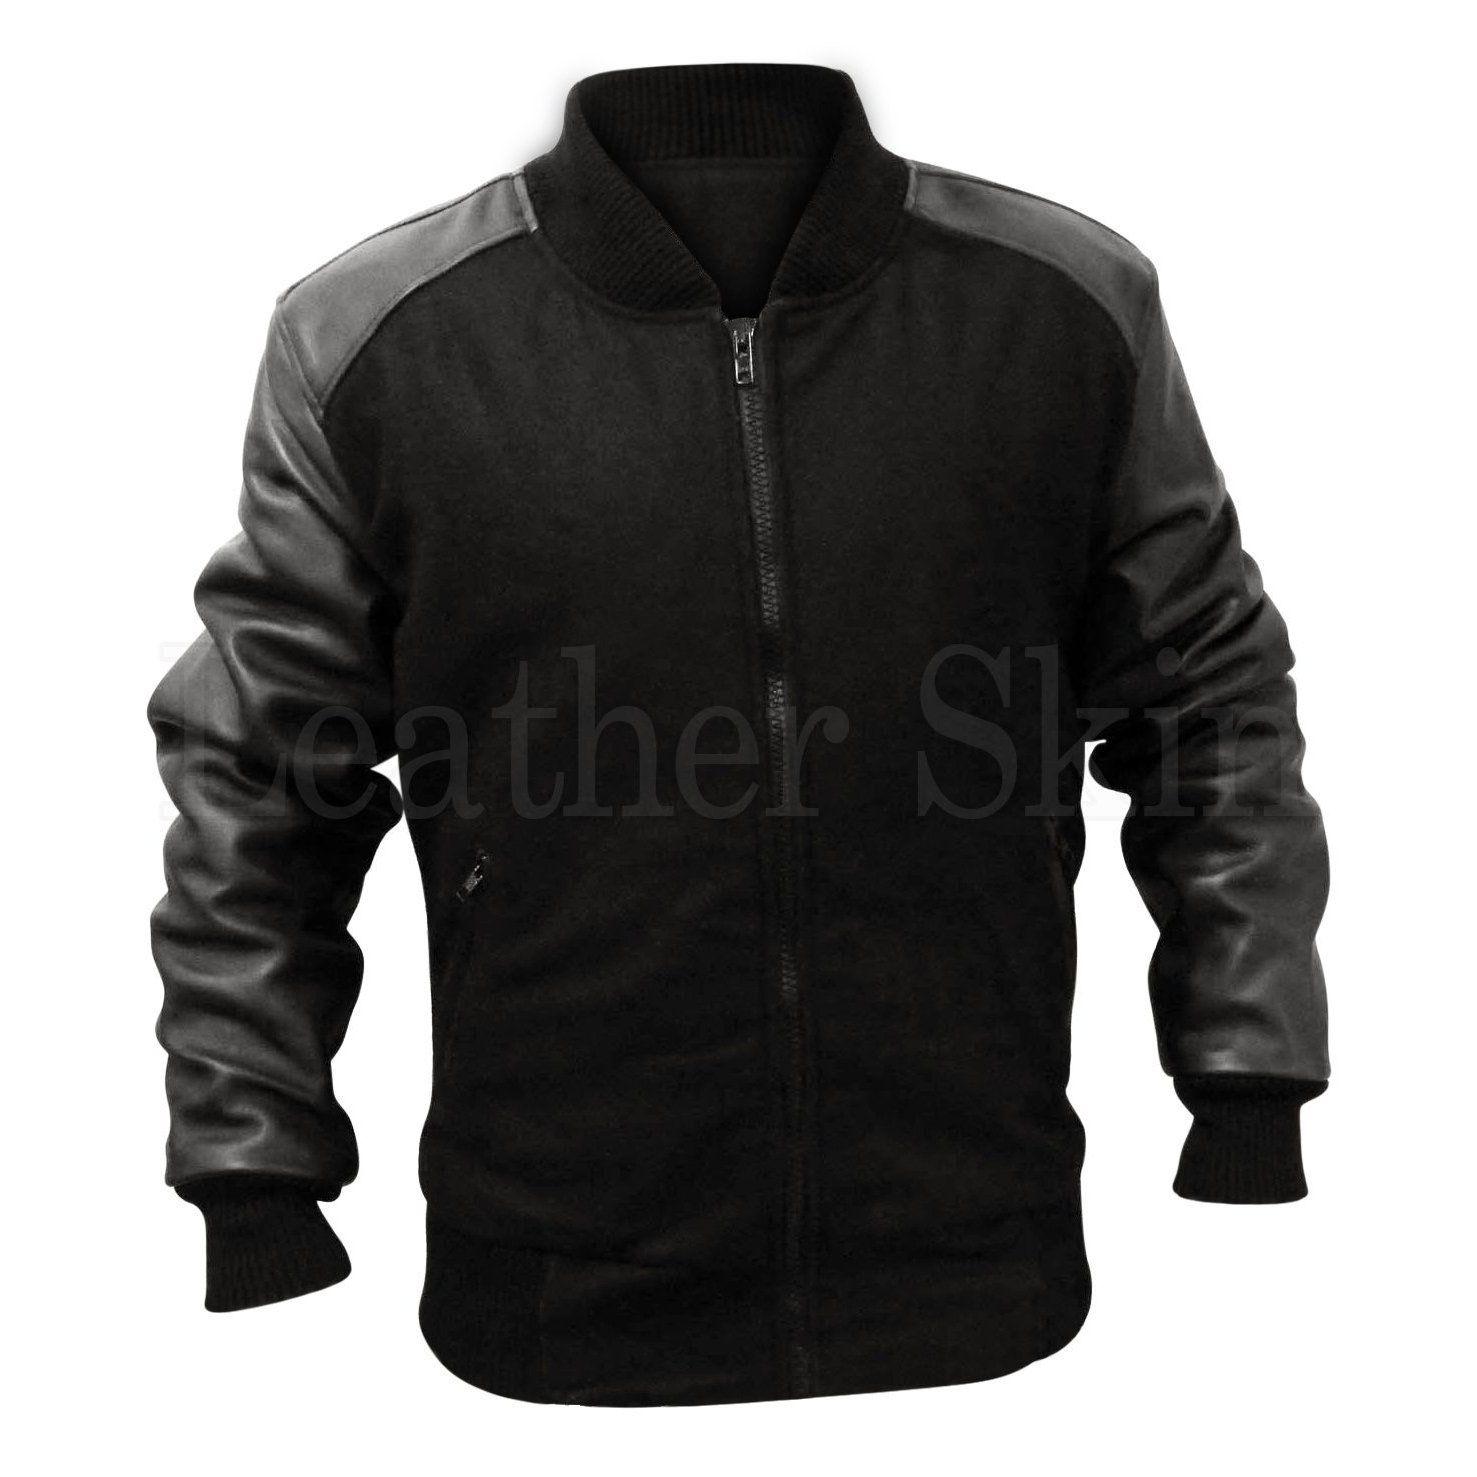 Men Black Fabric Premium Jacket With Leather Sleeves Elastic Bottom Leather Sleeve Jacket Best Leather Jackets Leather Sleeve [ 1477 x 1477 Pixel ]